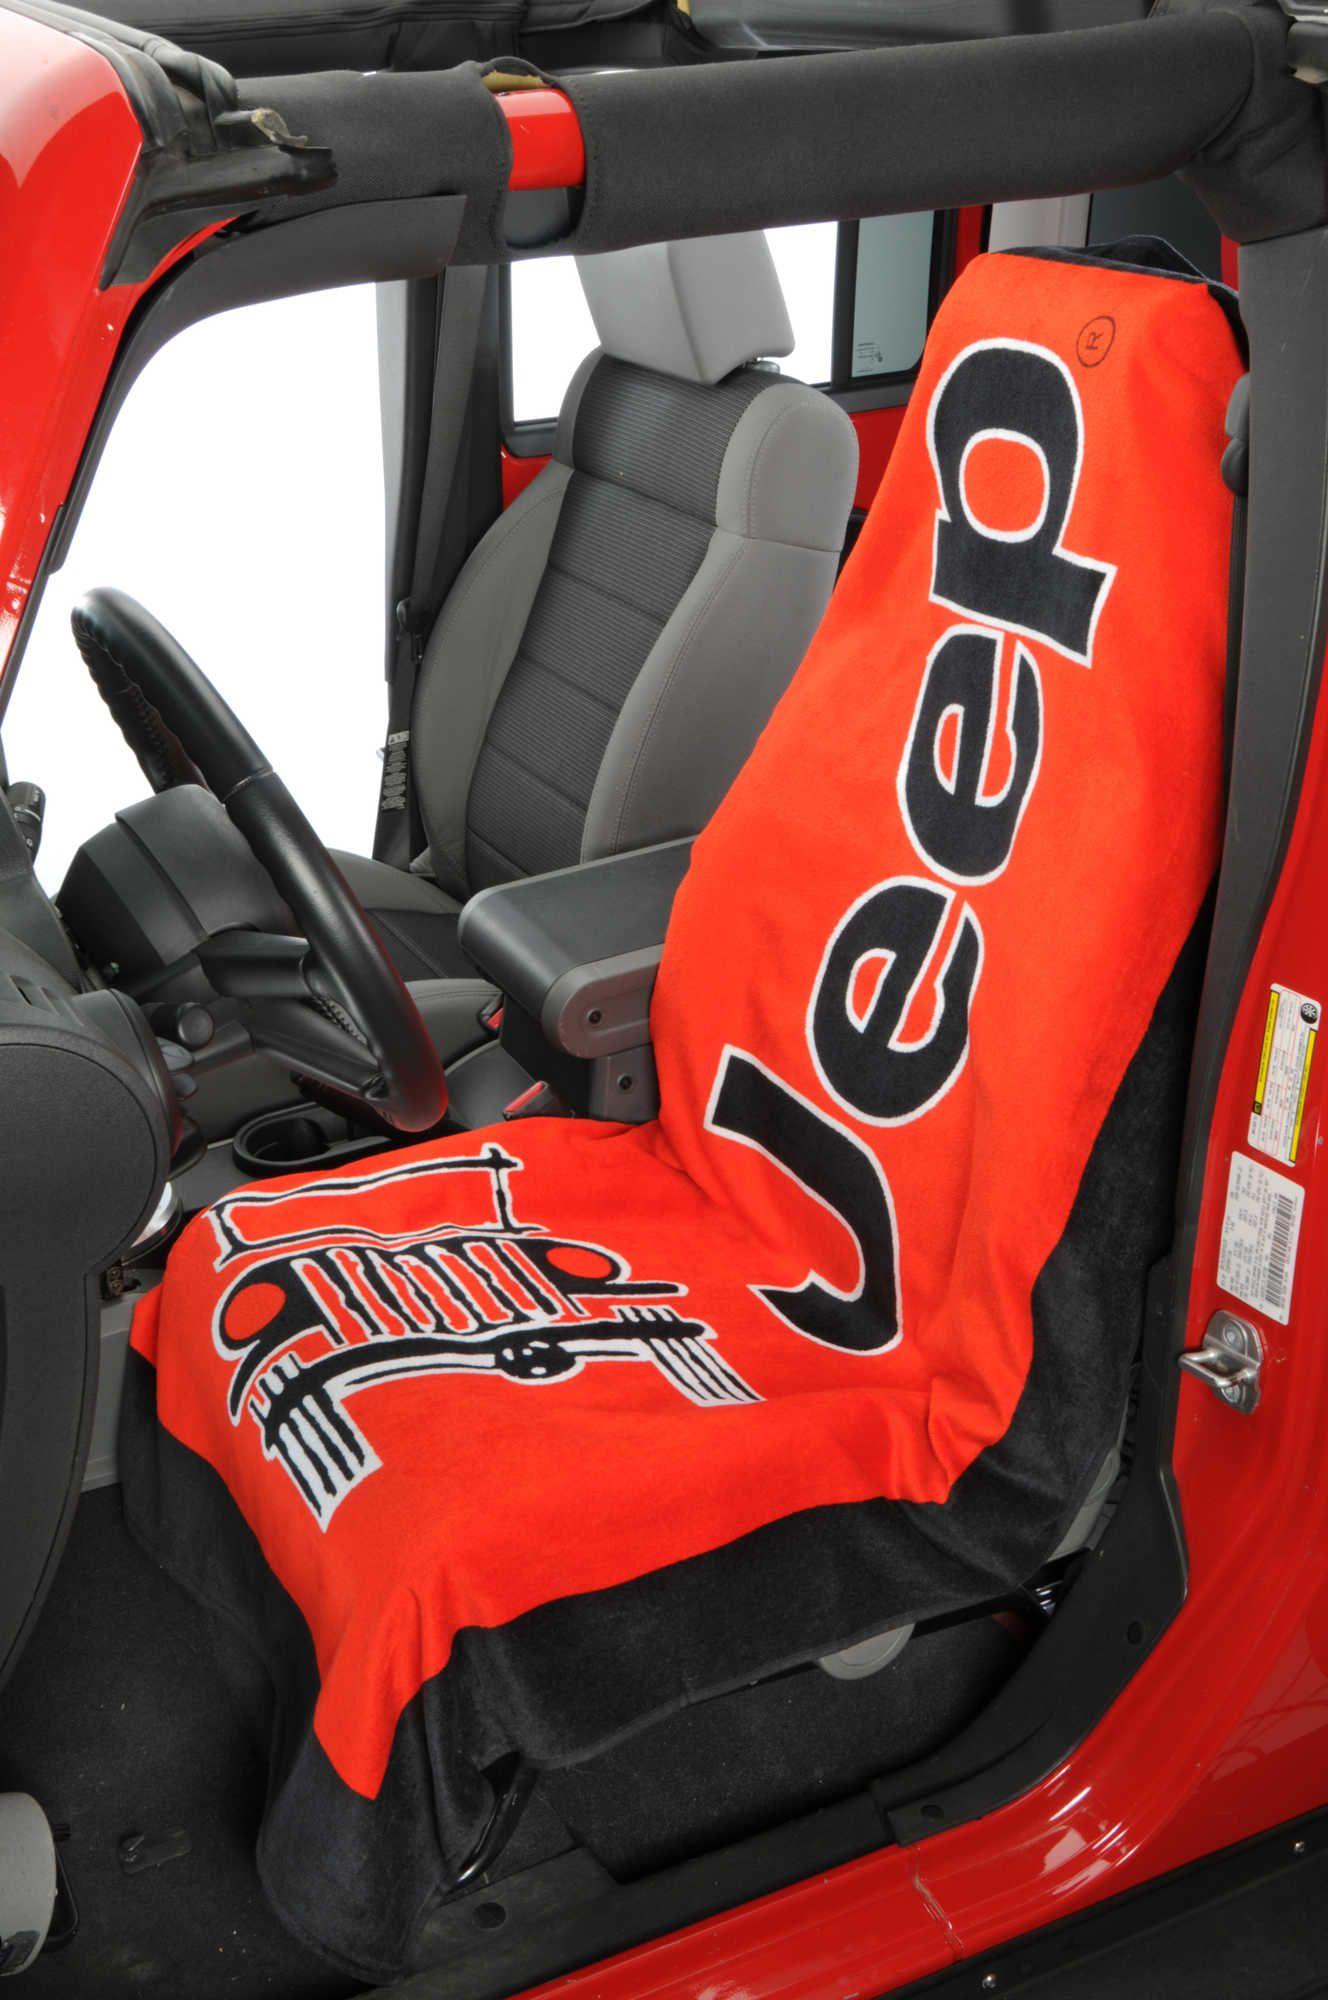 Insync Jeep Logo Towel 2 Go Seat Cover Jeep Wrangler Accessories Jeep Jeep Gear